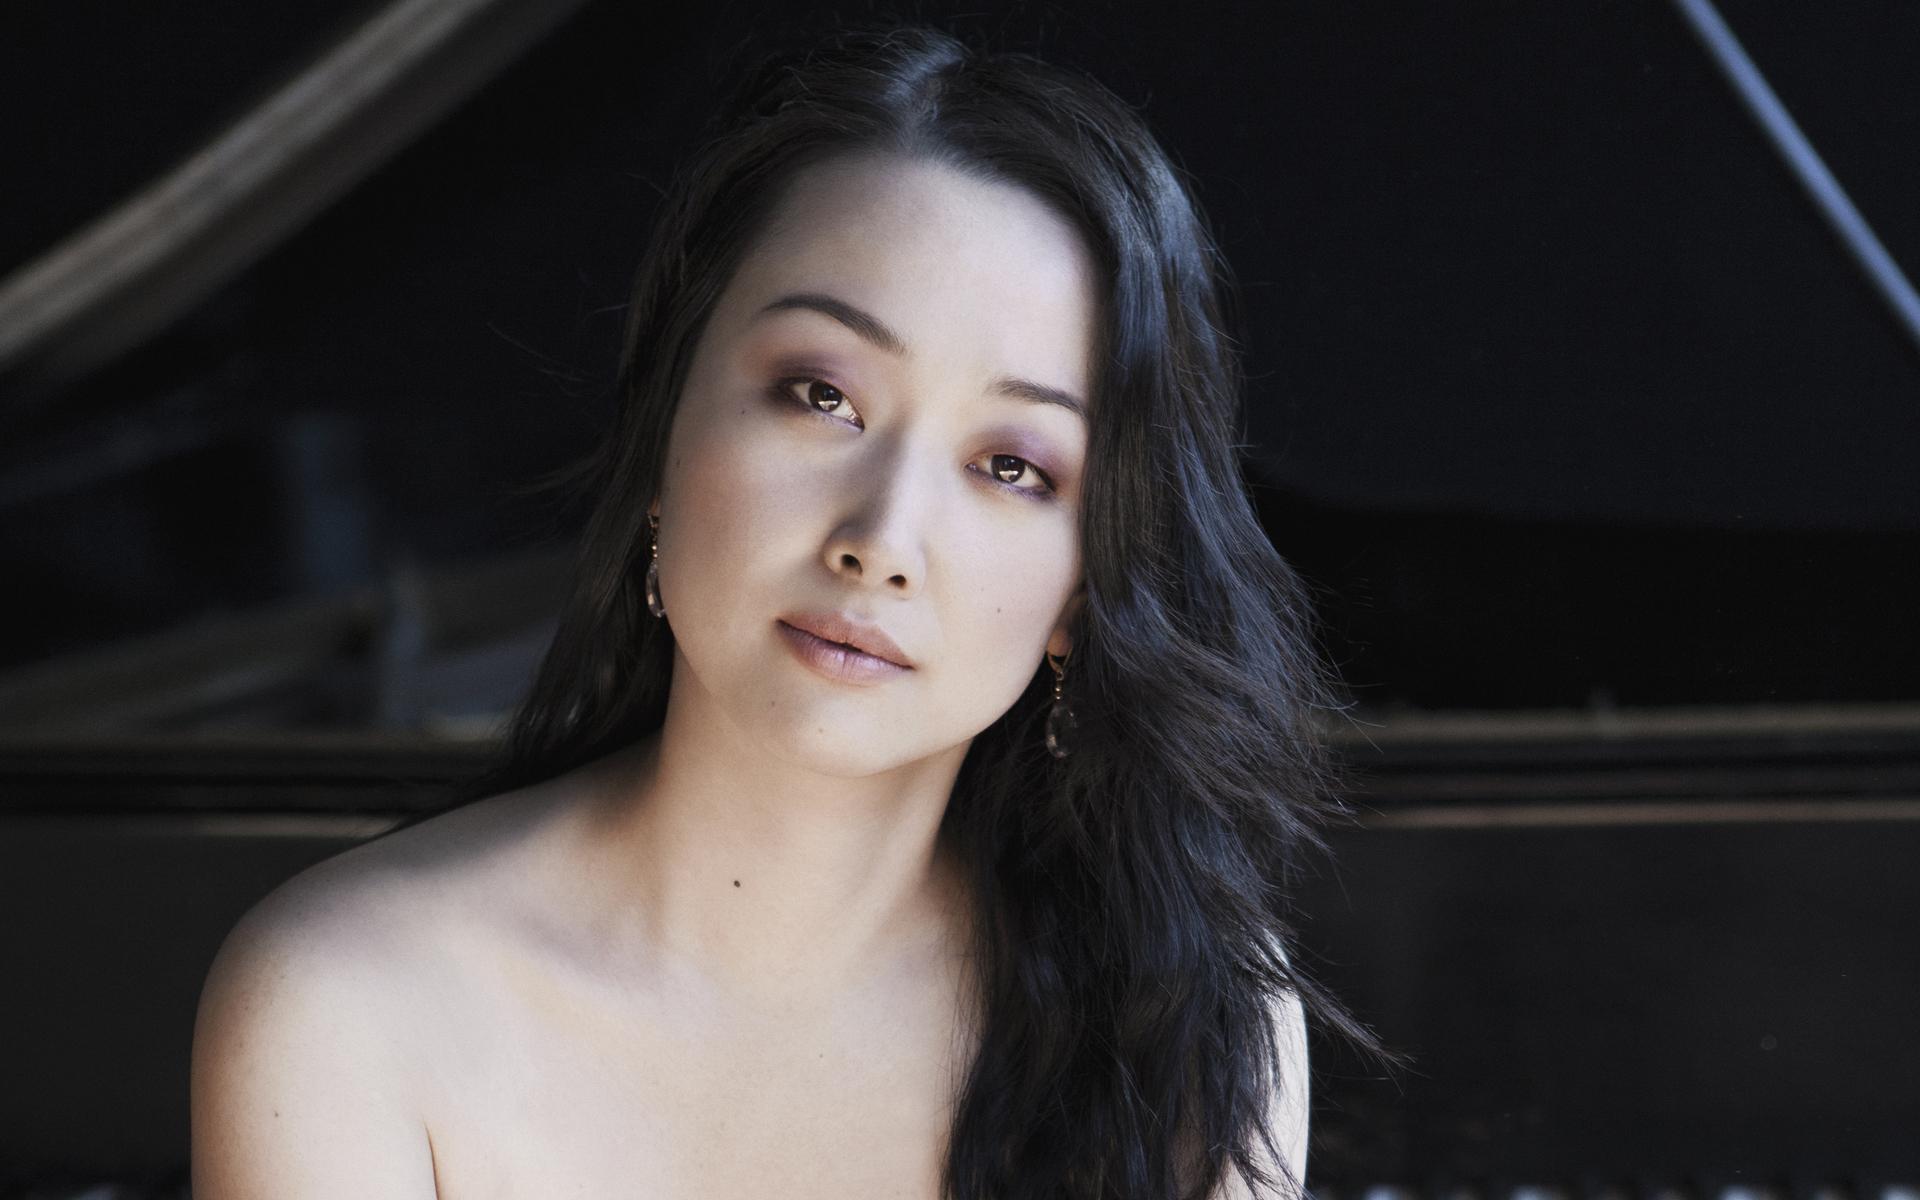 Miori Sugiyama